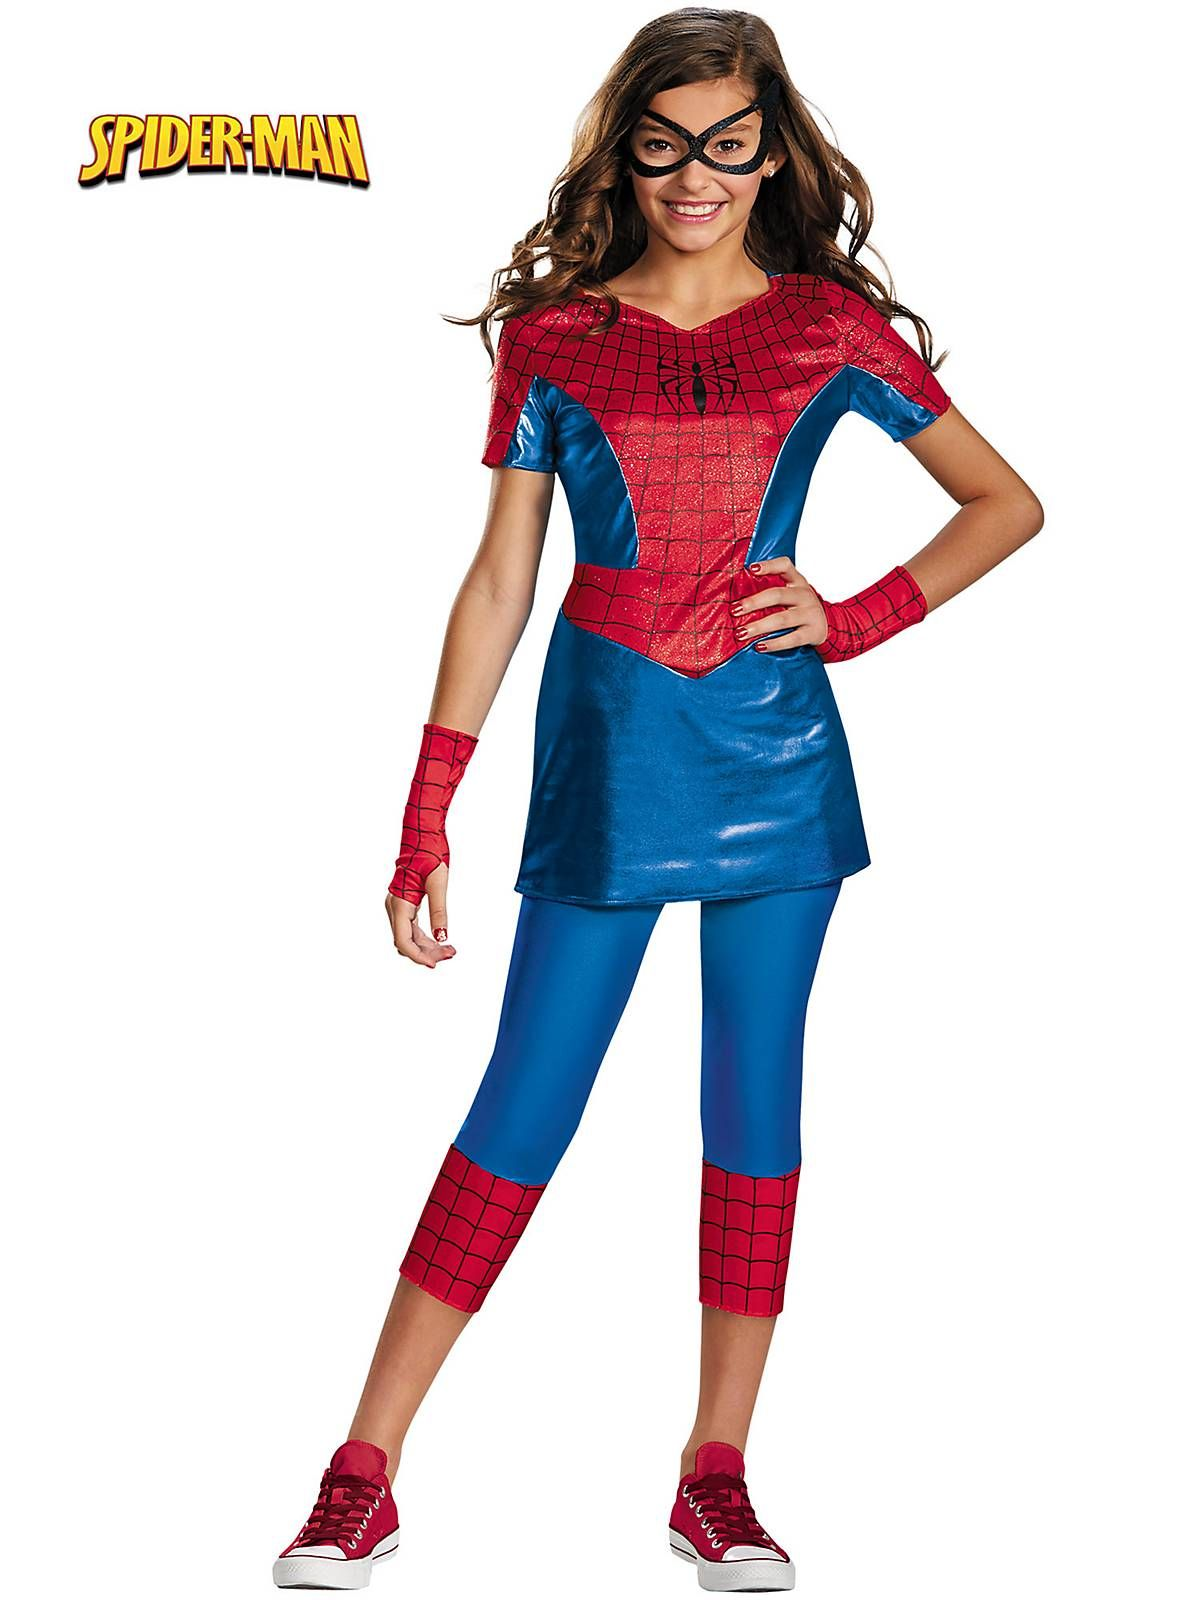 Girl's SpiderGirl Tween Costume! See more costume ideas